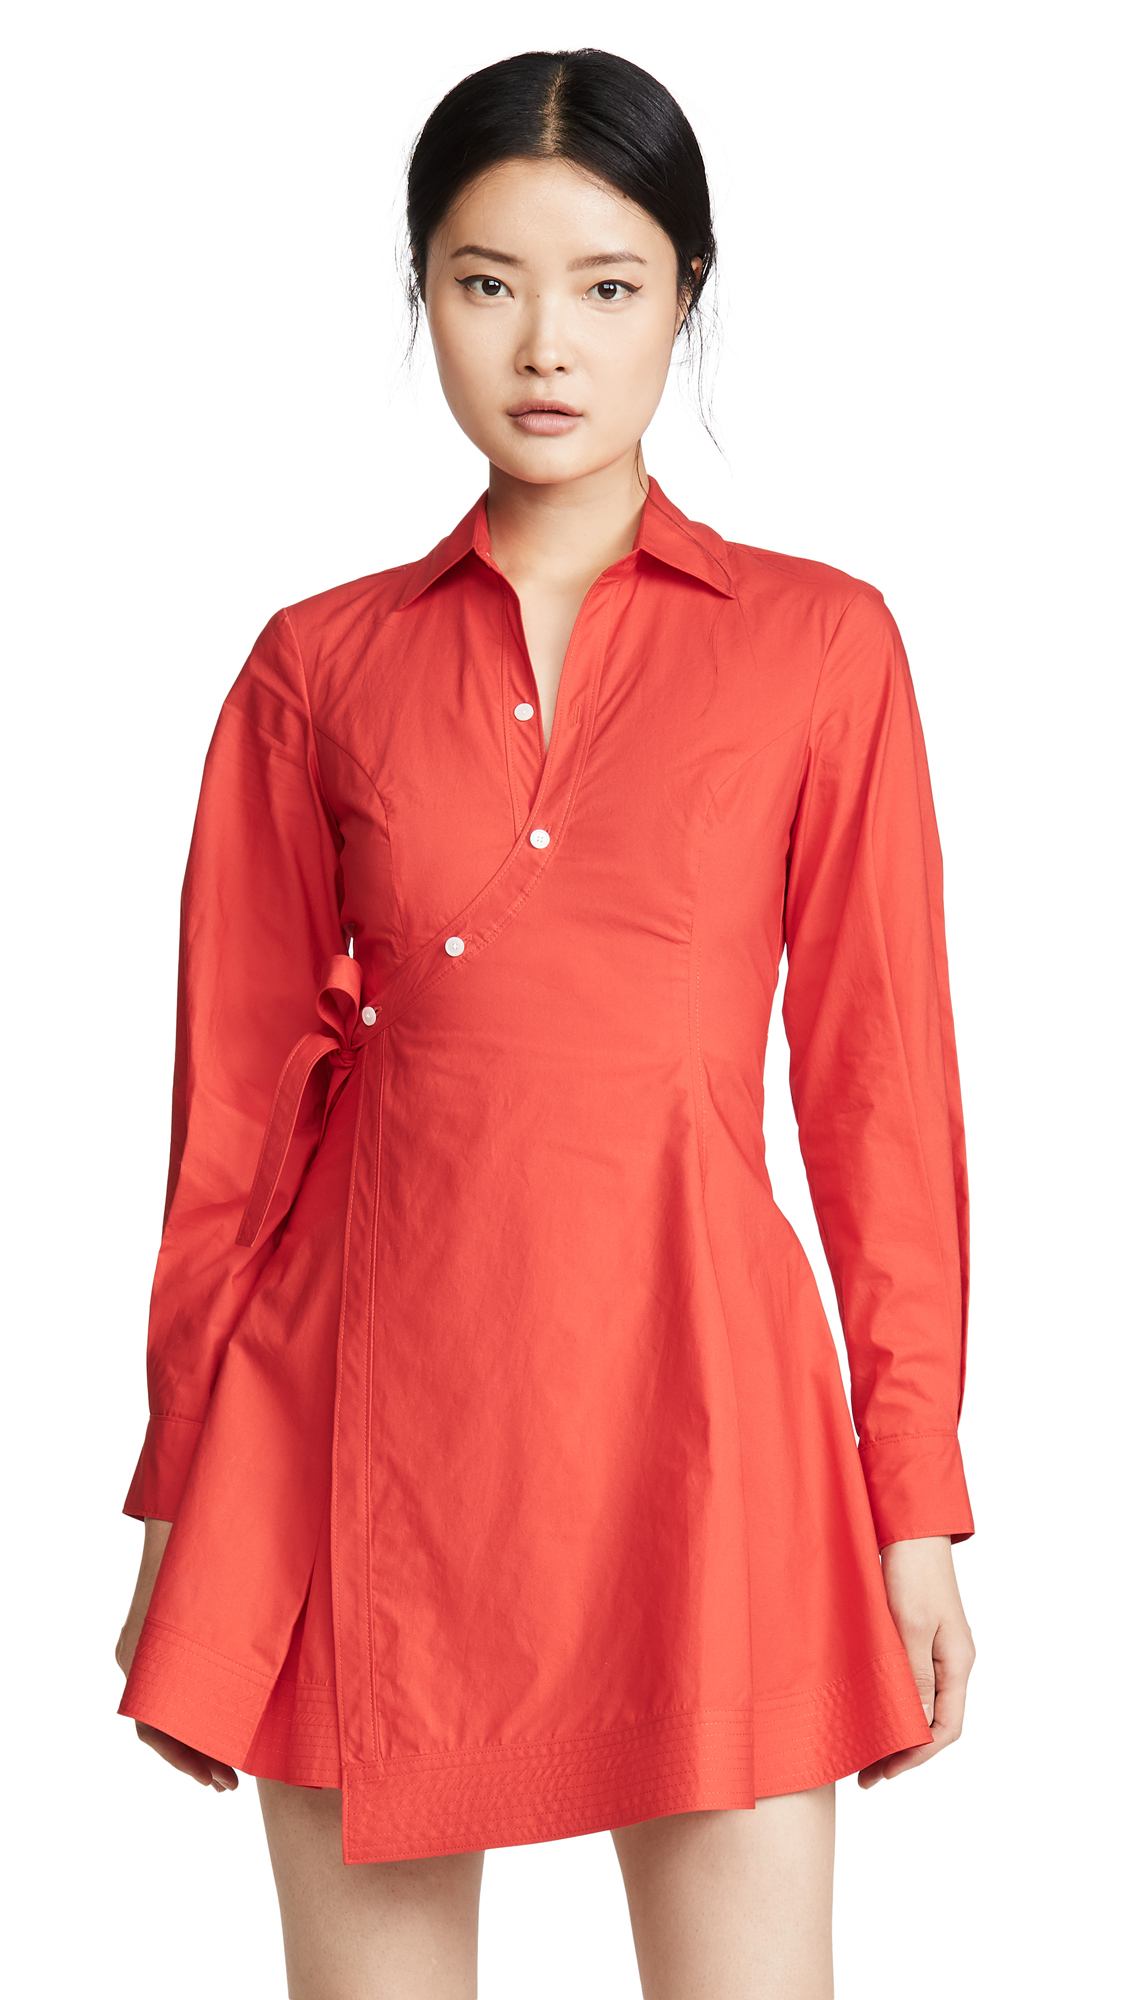 Derek Lam 10 Crosby Petra Wrap Shirtdress - 40% Off Sale